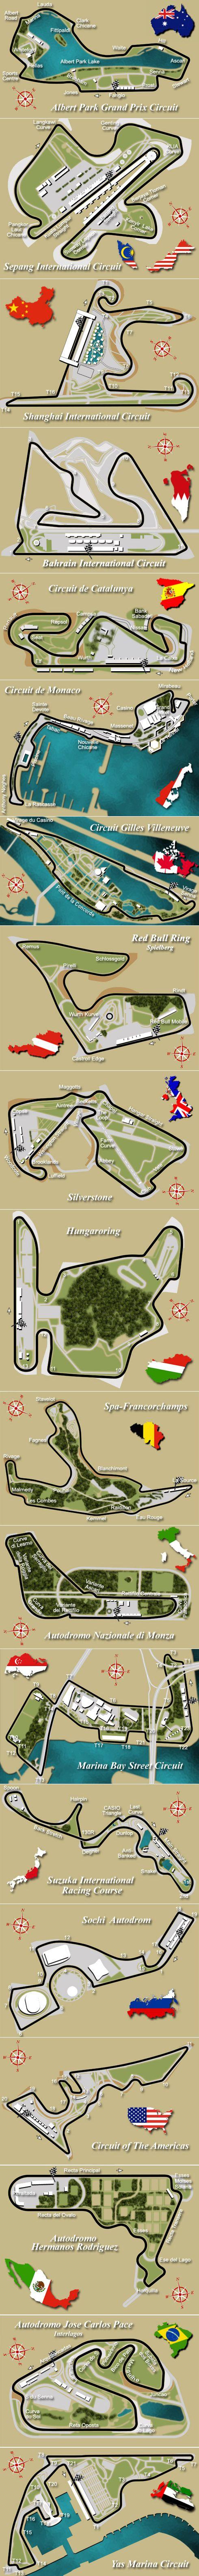 2015 Formula One Circuits